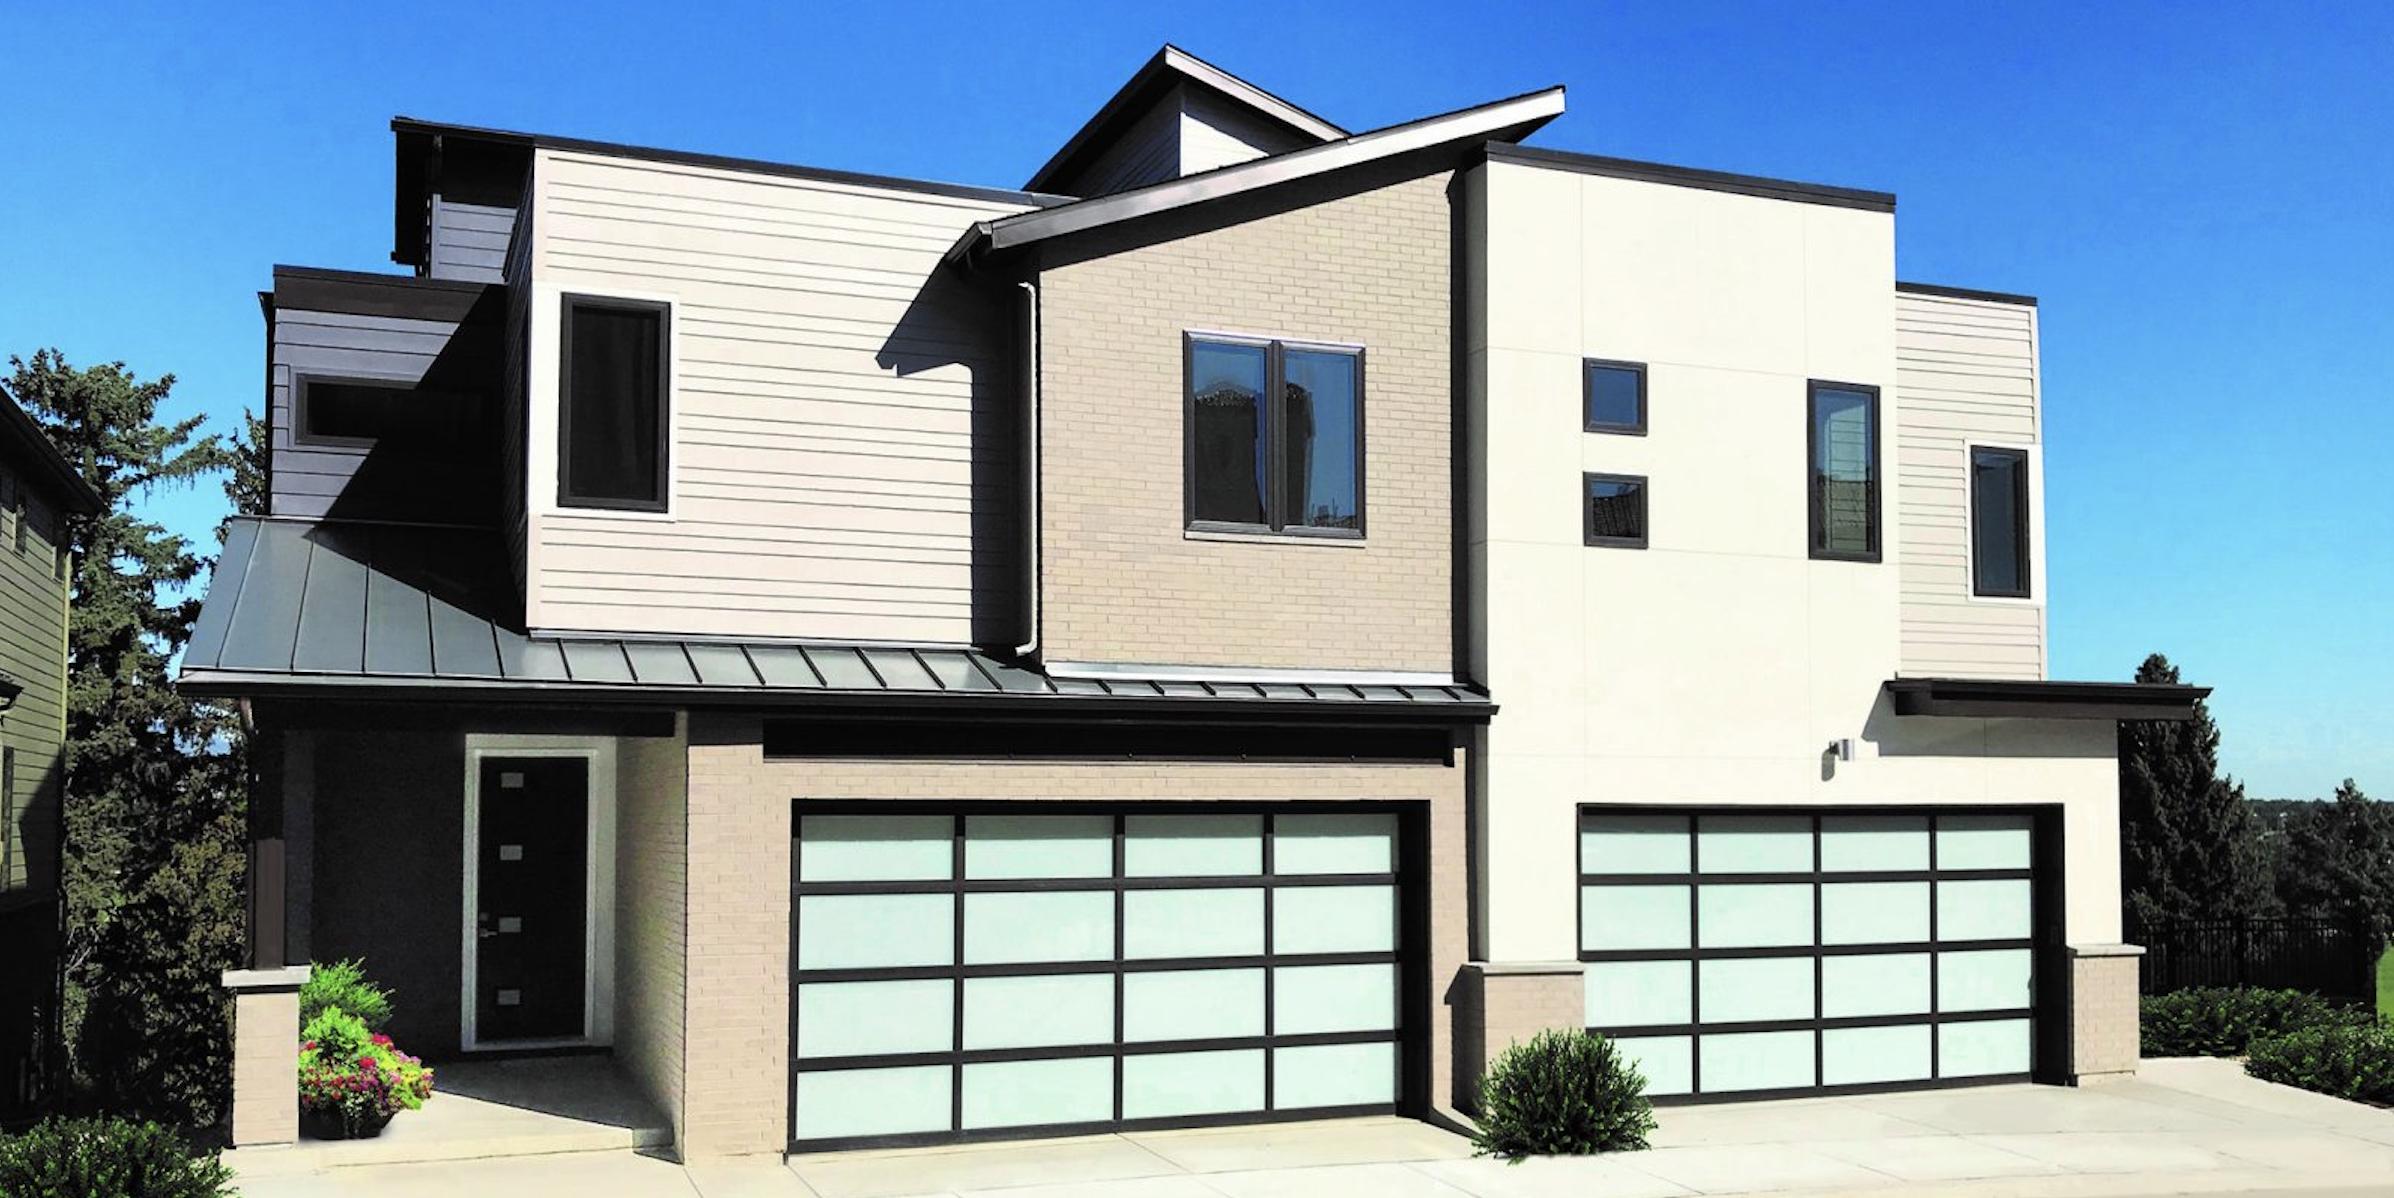 5390' Community by Koelbel in the Berkeley Tennyson Neighborhood Denver New Construction Homes For Sale Elevation